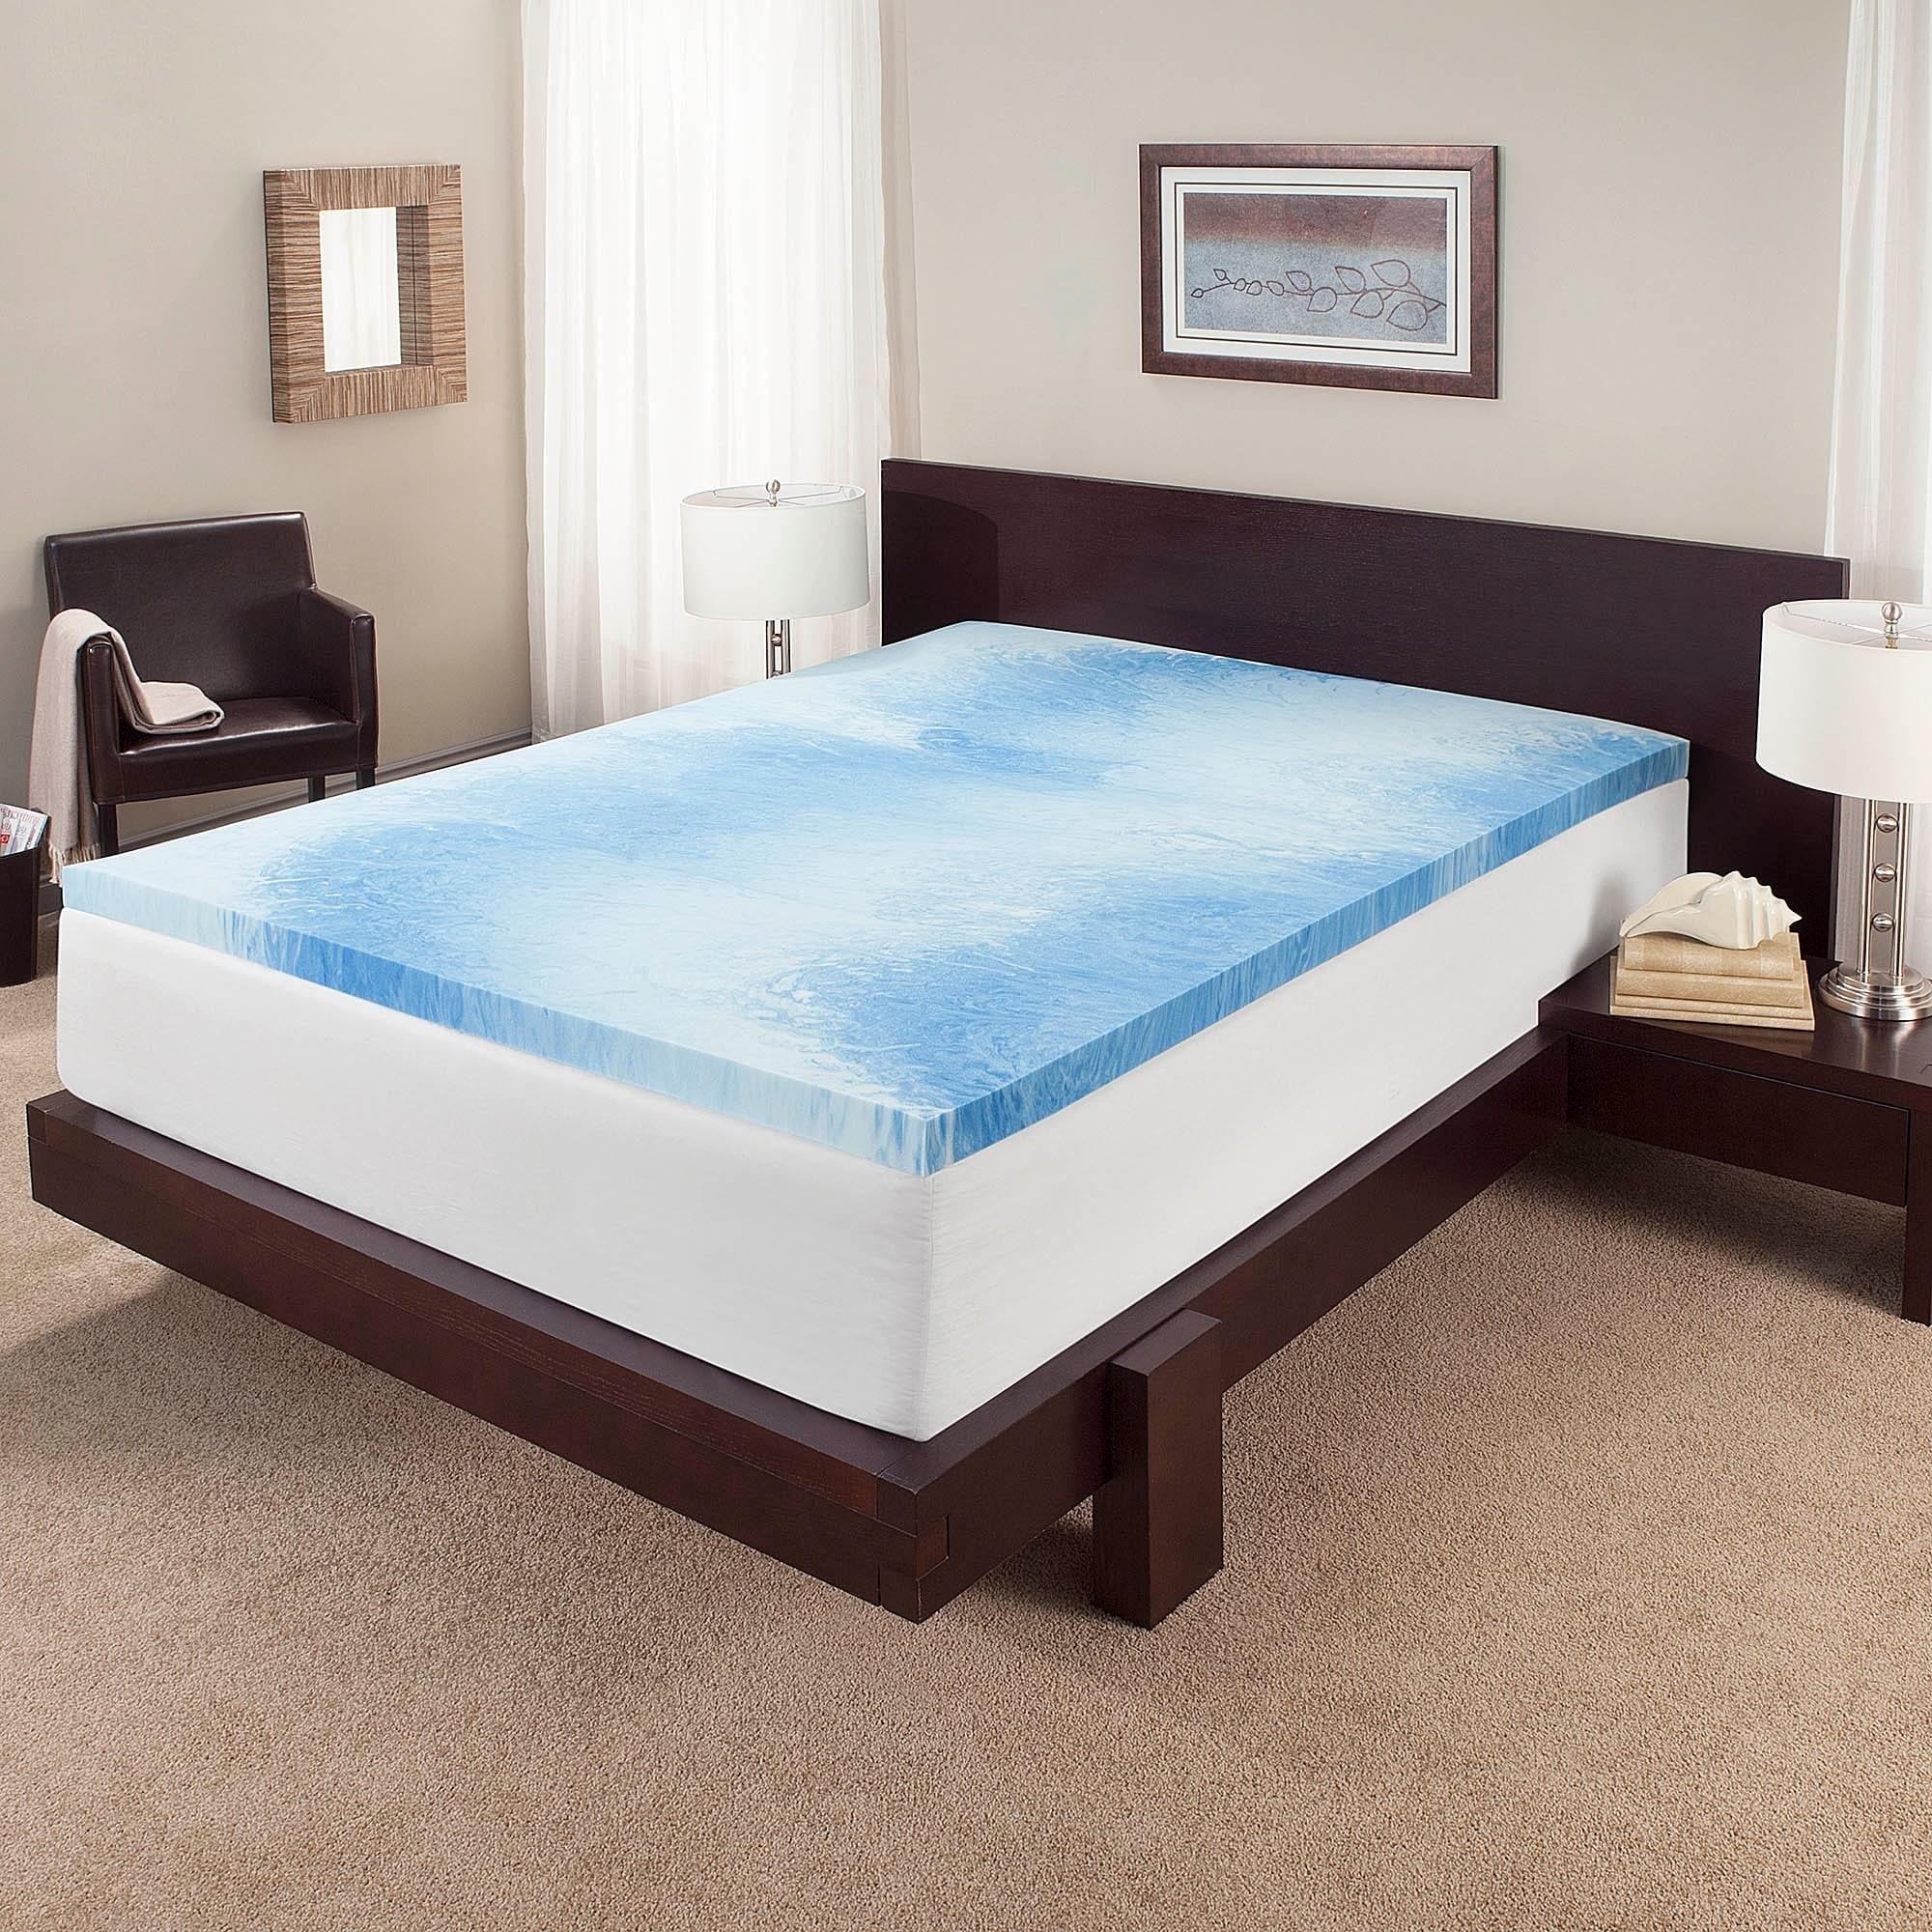 mattress inch topper gel bedding pin independent memory foam